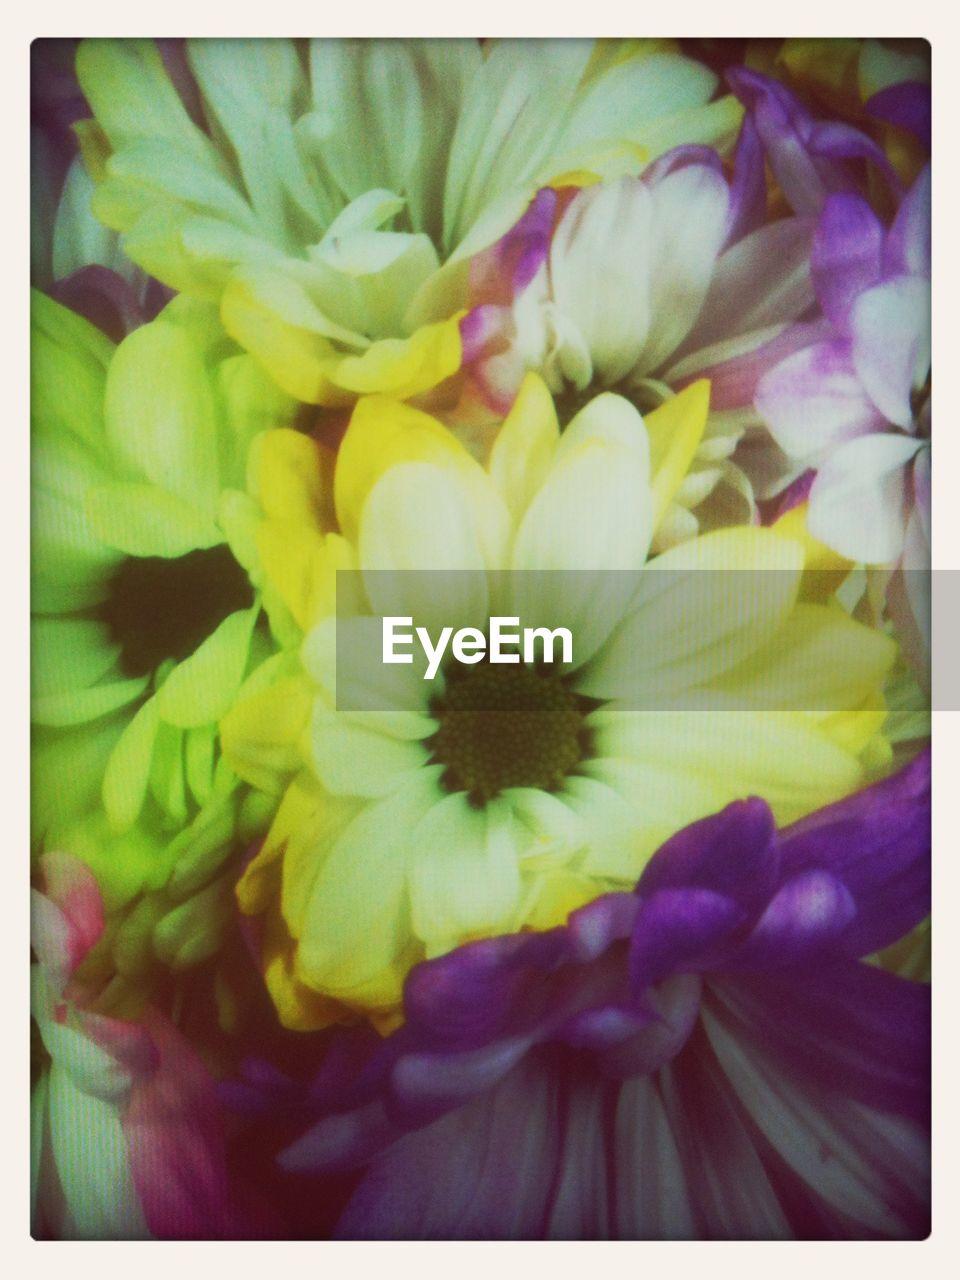 Detail shot of flowers